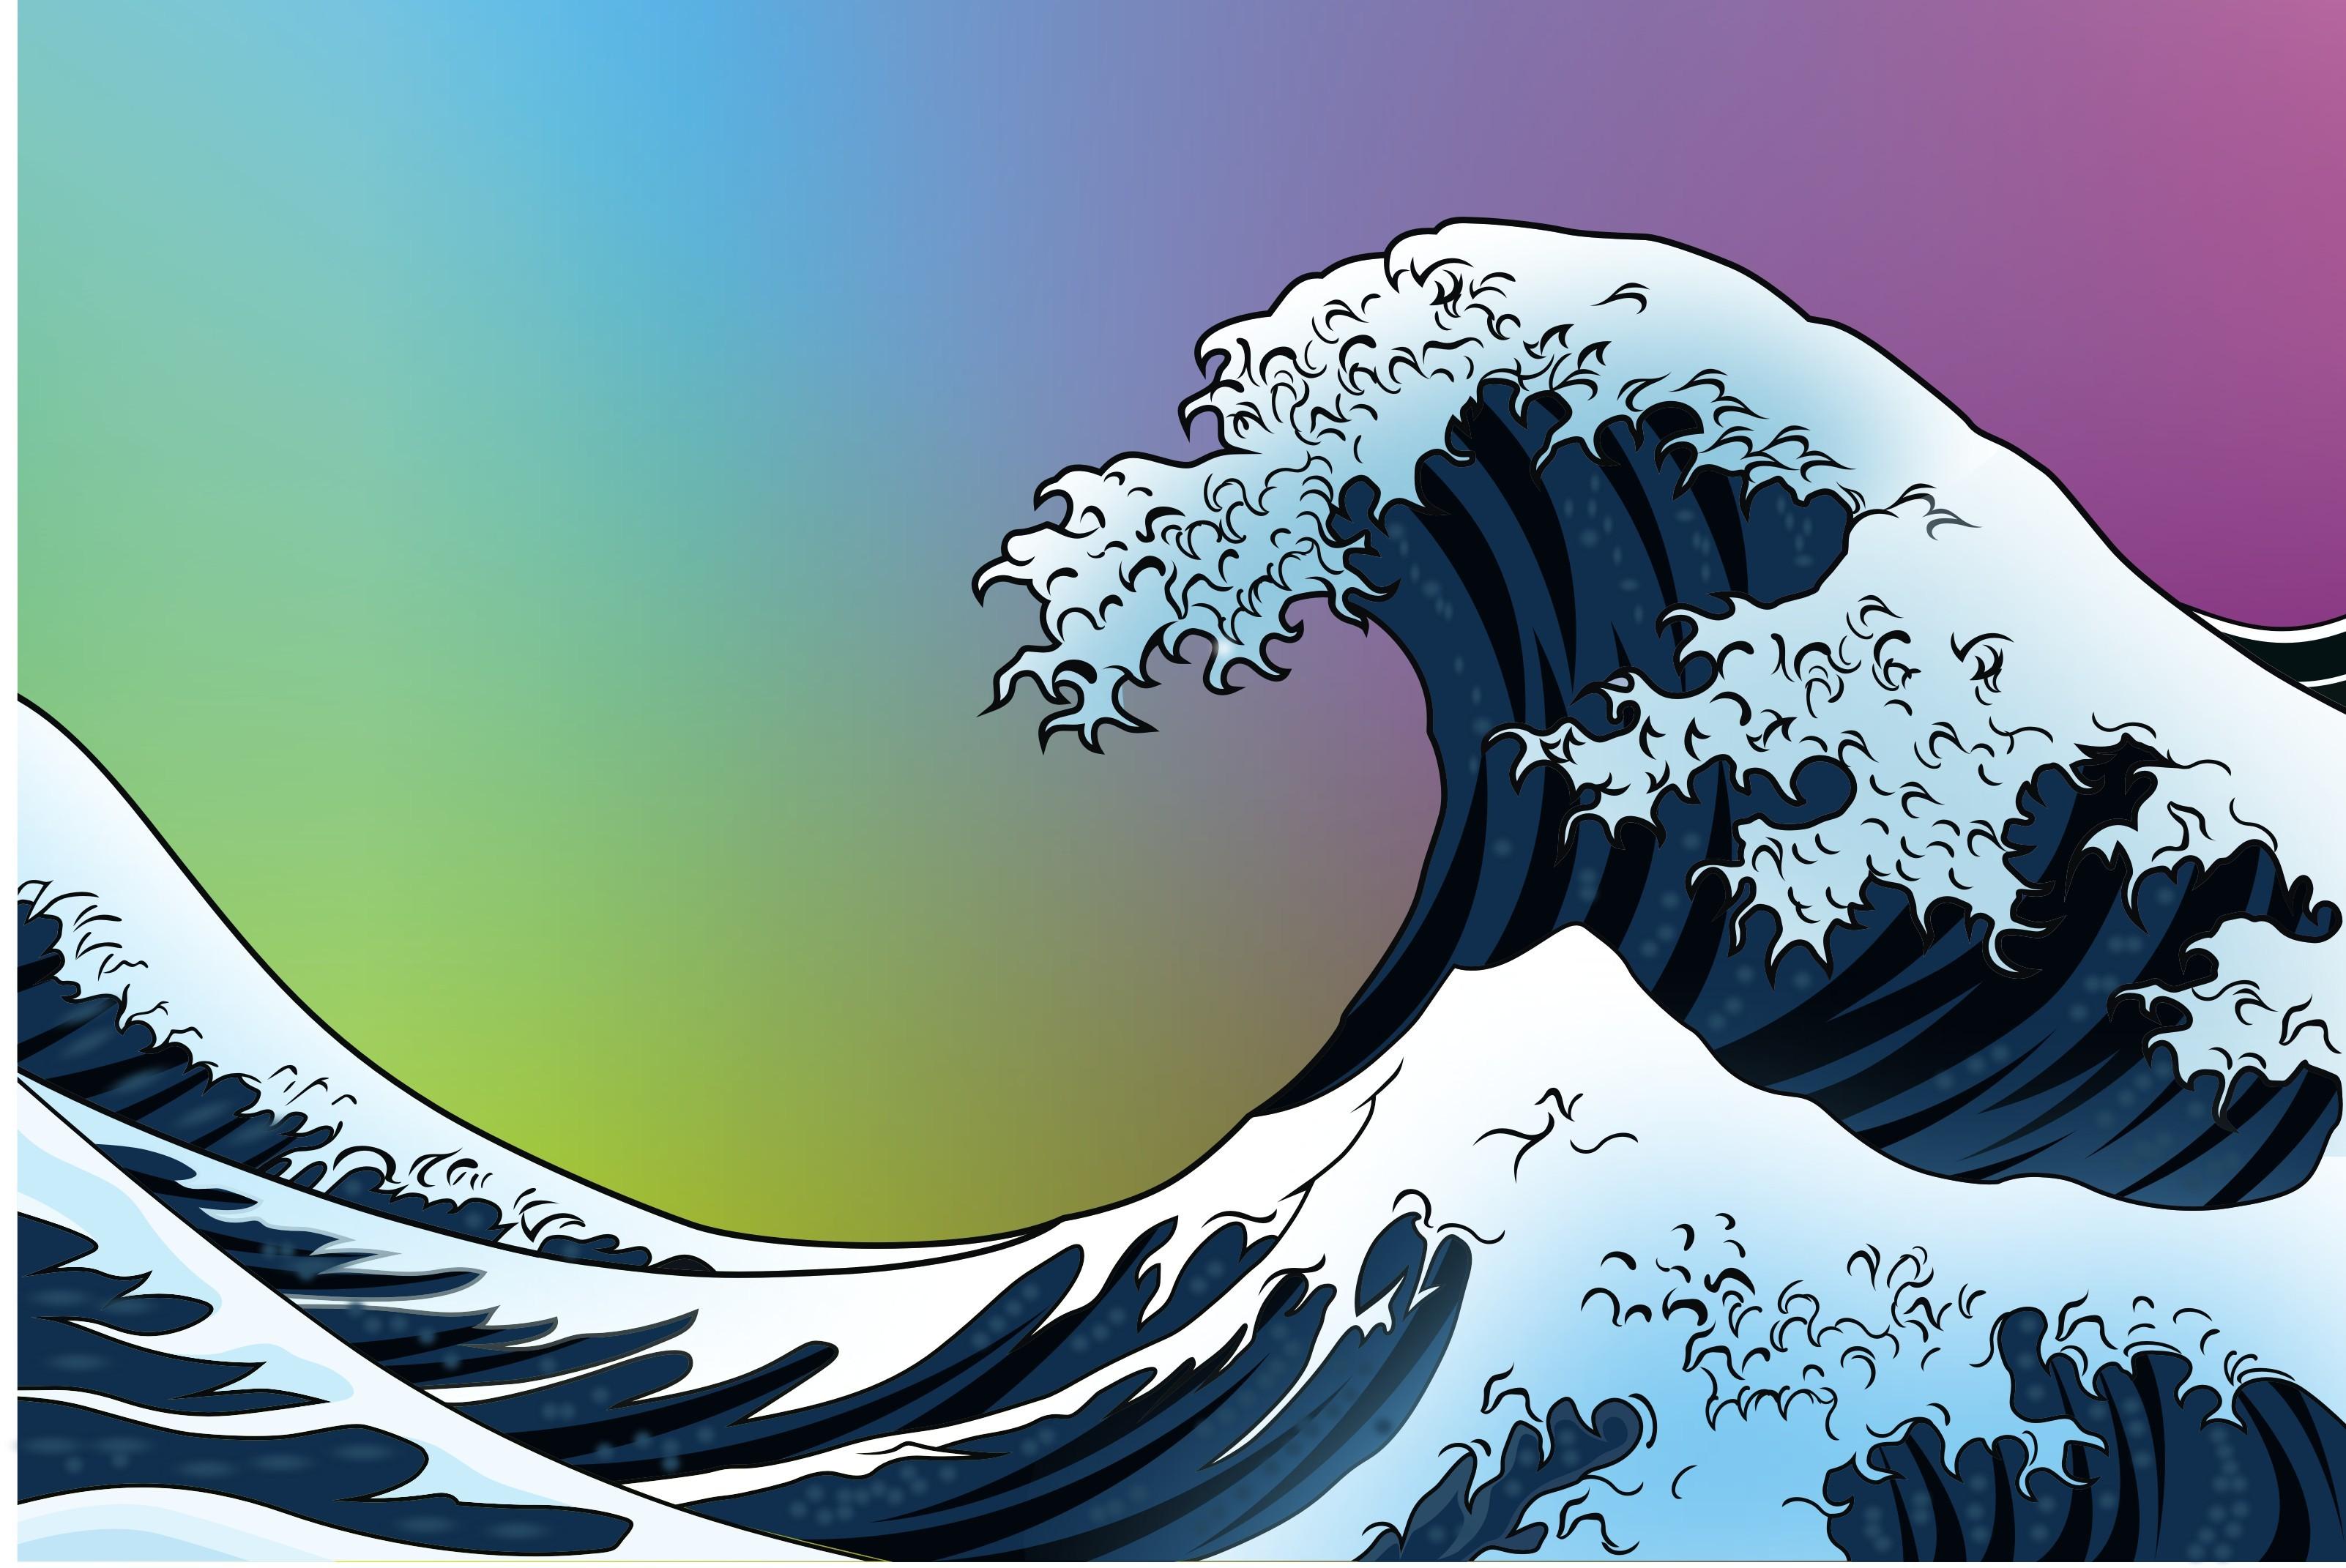 Res: 3204x2142, The Great Wave Off Kanagawa Wallpaper Beautiful Japanese Wave Still Life  Vector My Artworks